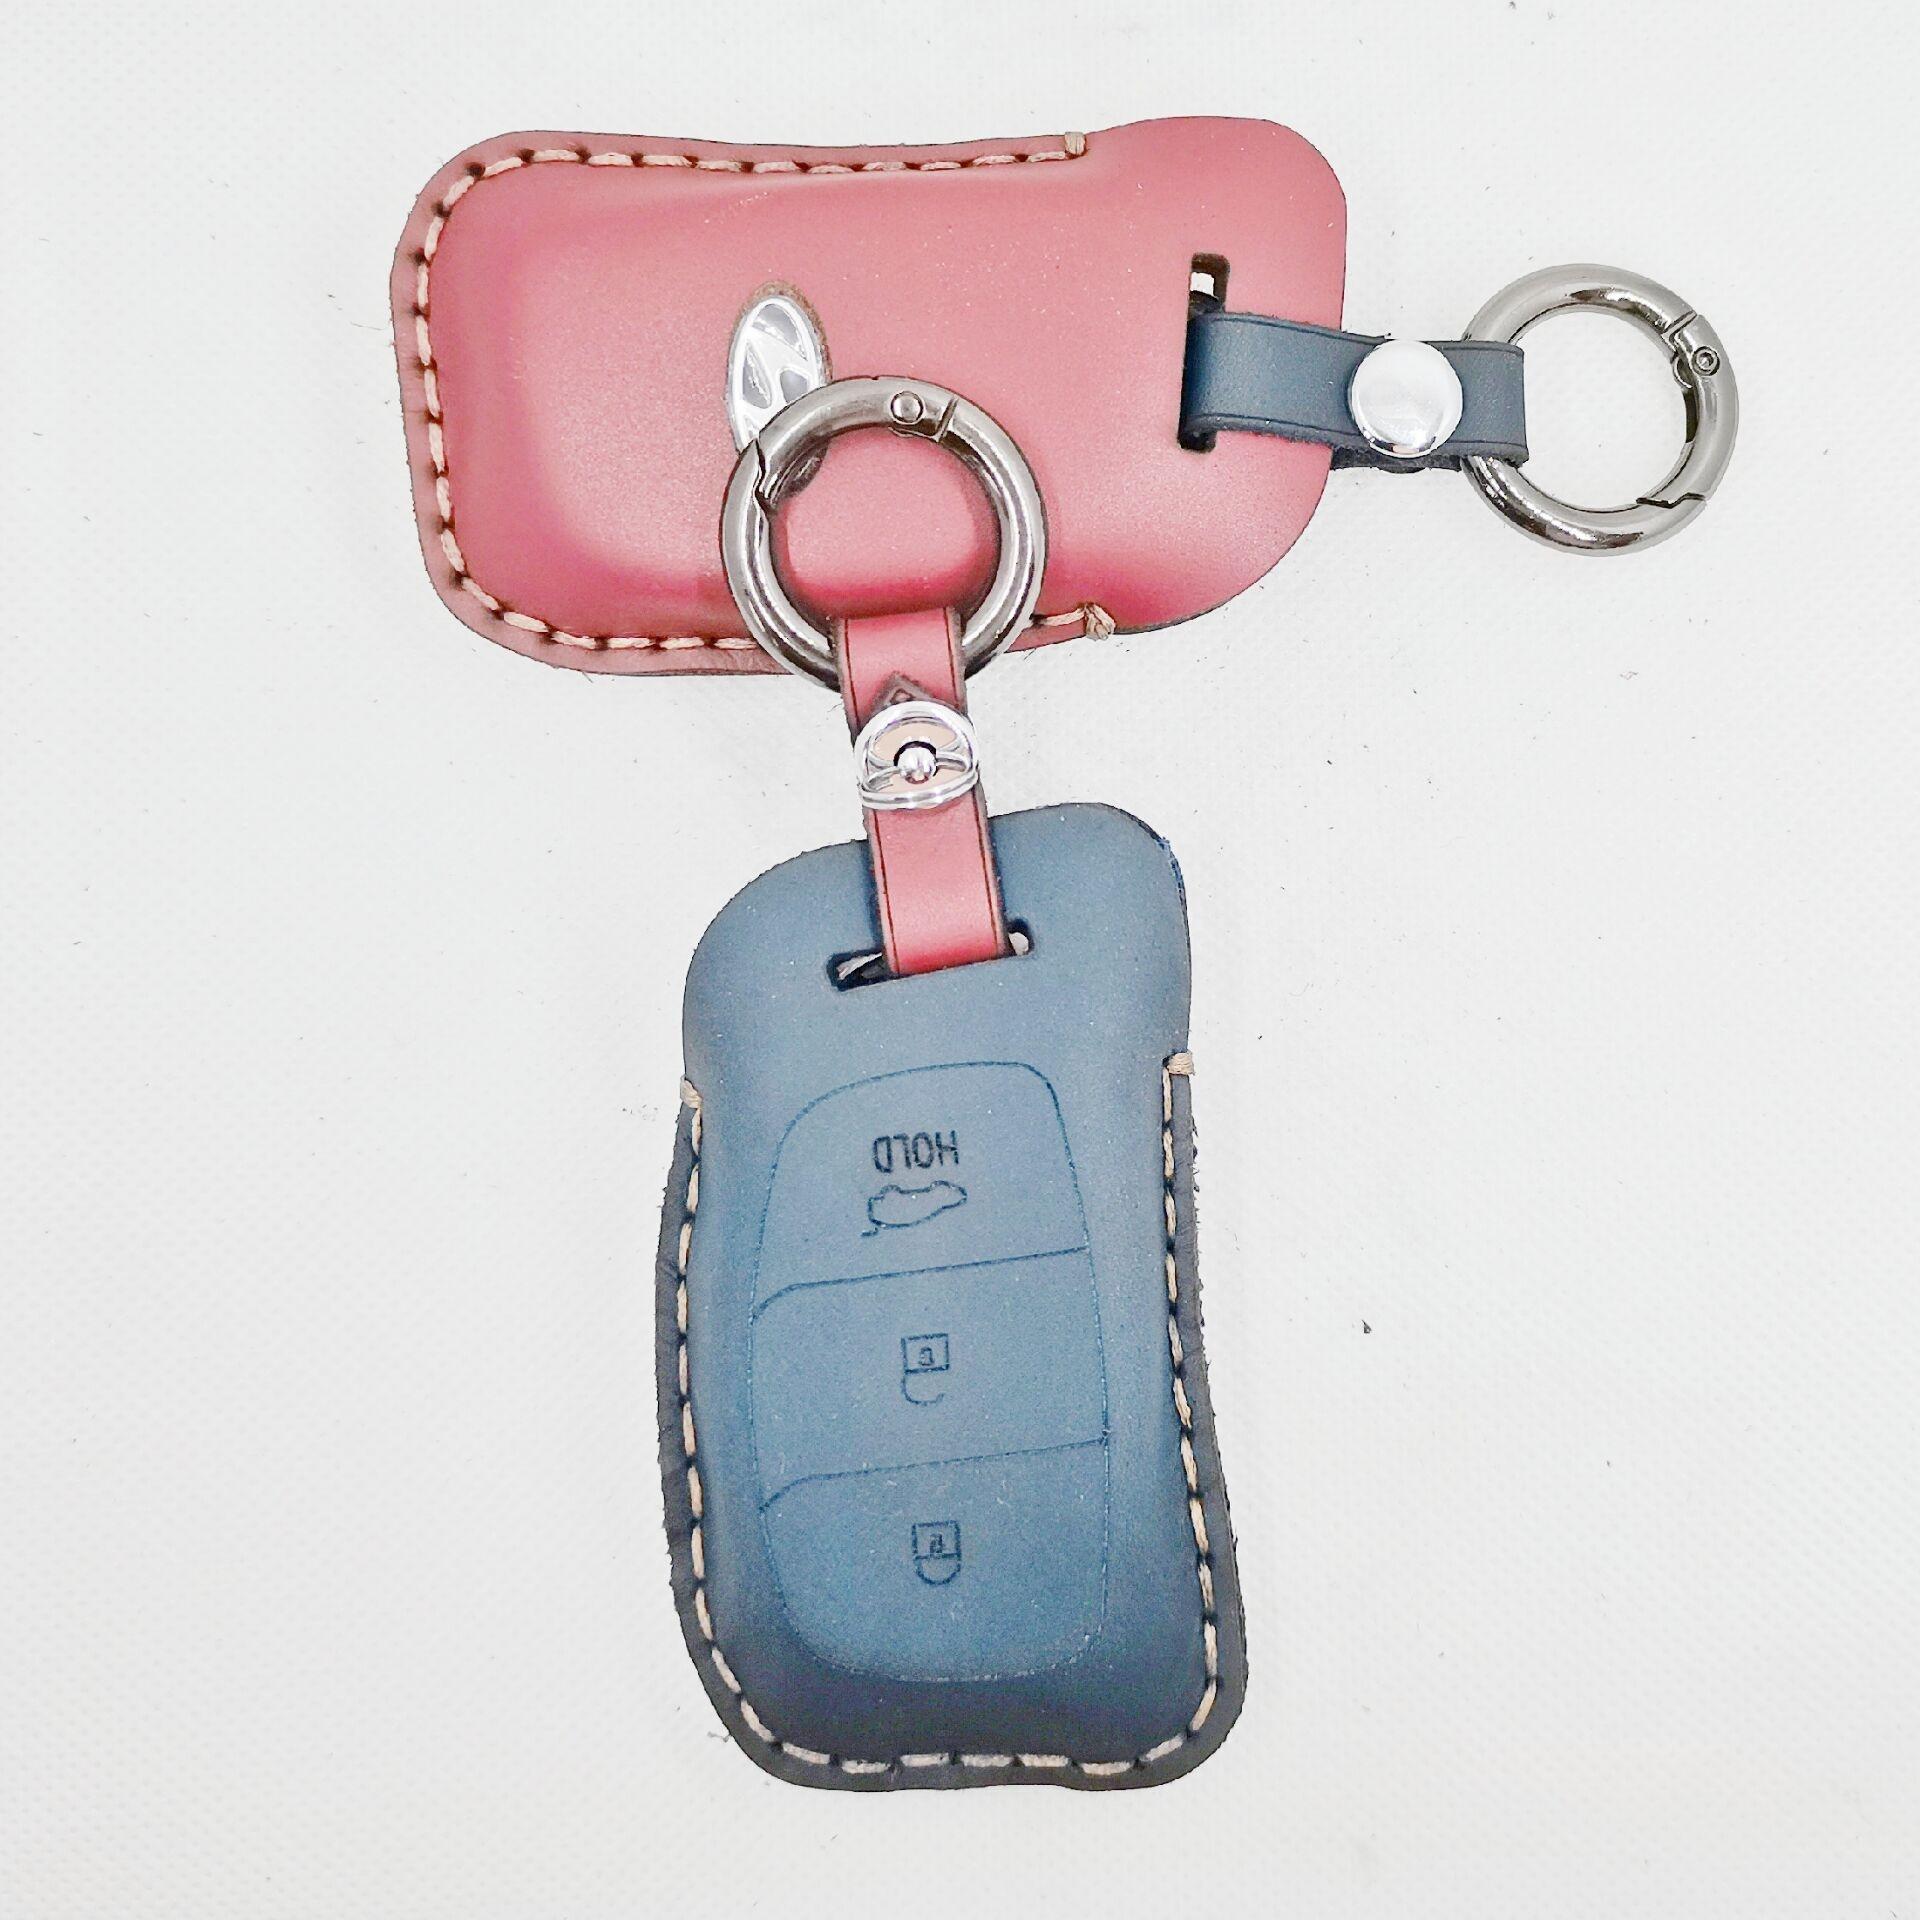 Car Key Case Leather Smart Remote Cover Keychain Protect Bag For Hyundai IX30 IX35 IX20 Tucson Elantra Verna Sonata Accessories